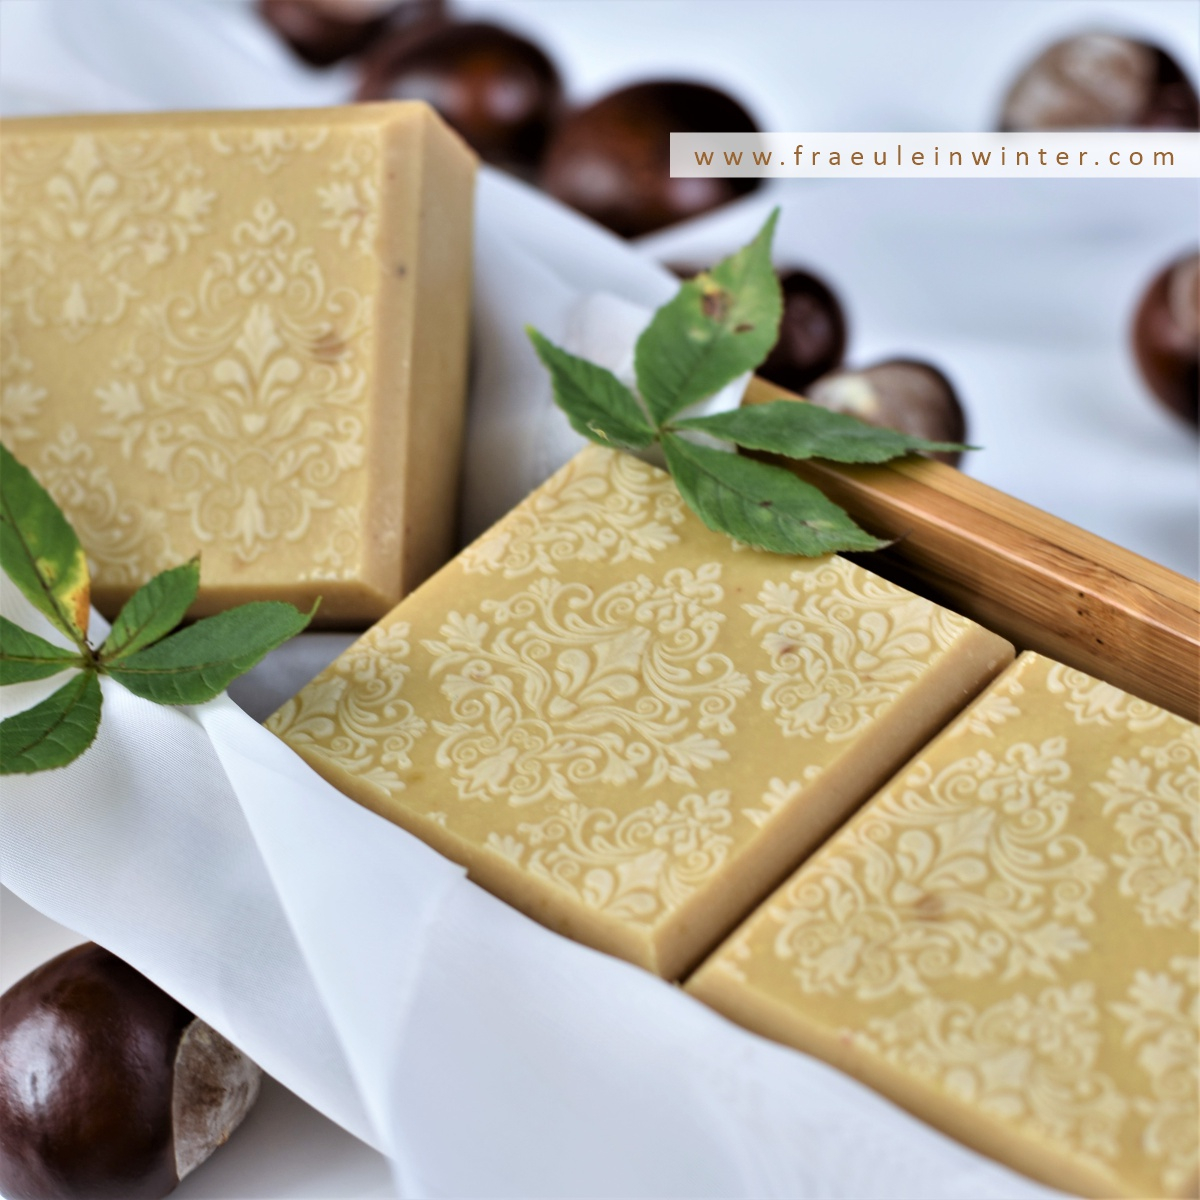 Chestnut Soap